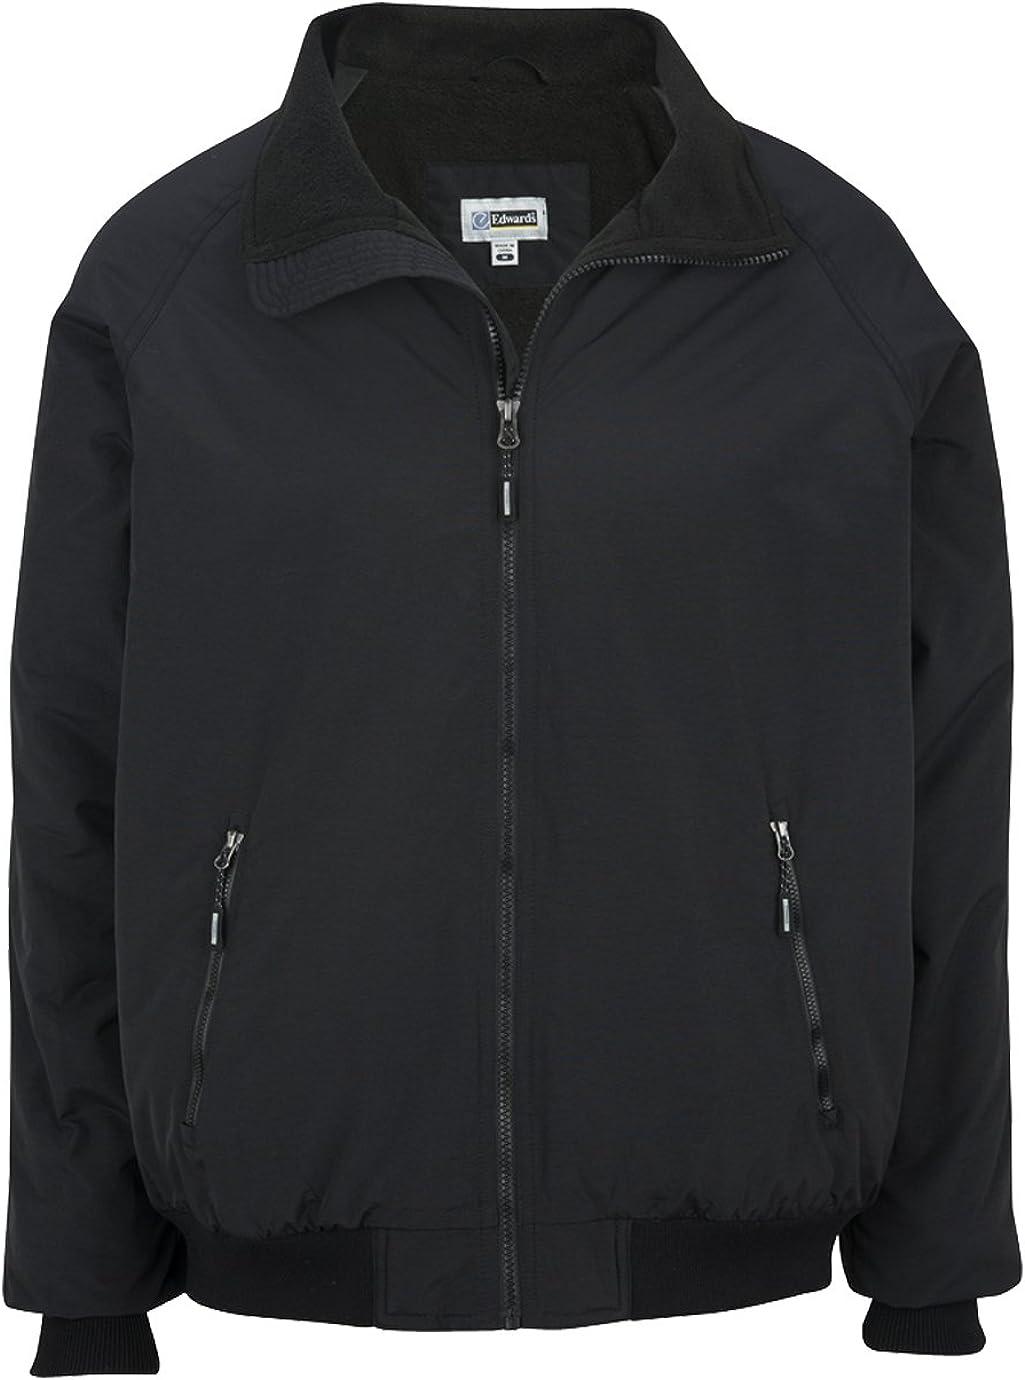 Sale price Ed Garments Jacket Max 67% OFF 3-Season